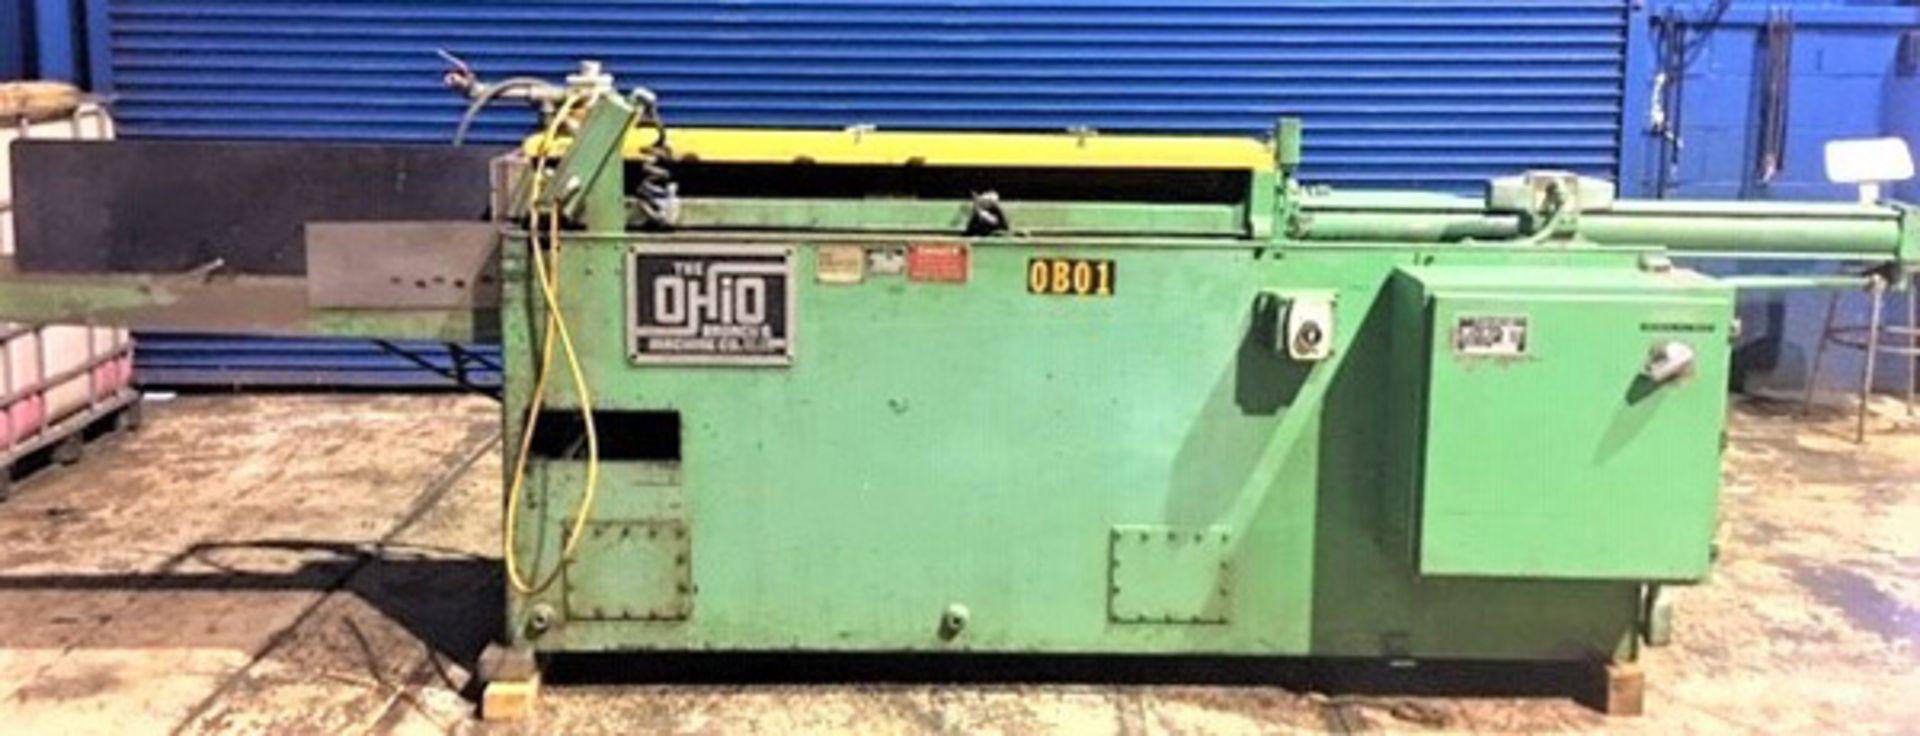 "Lot 14 - Ohio Horizontal Broaching Machine   5-Ton x 48"", Mdl: H548RR, S/N: 18125-76 - 8429P"